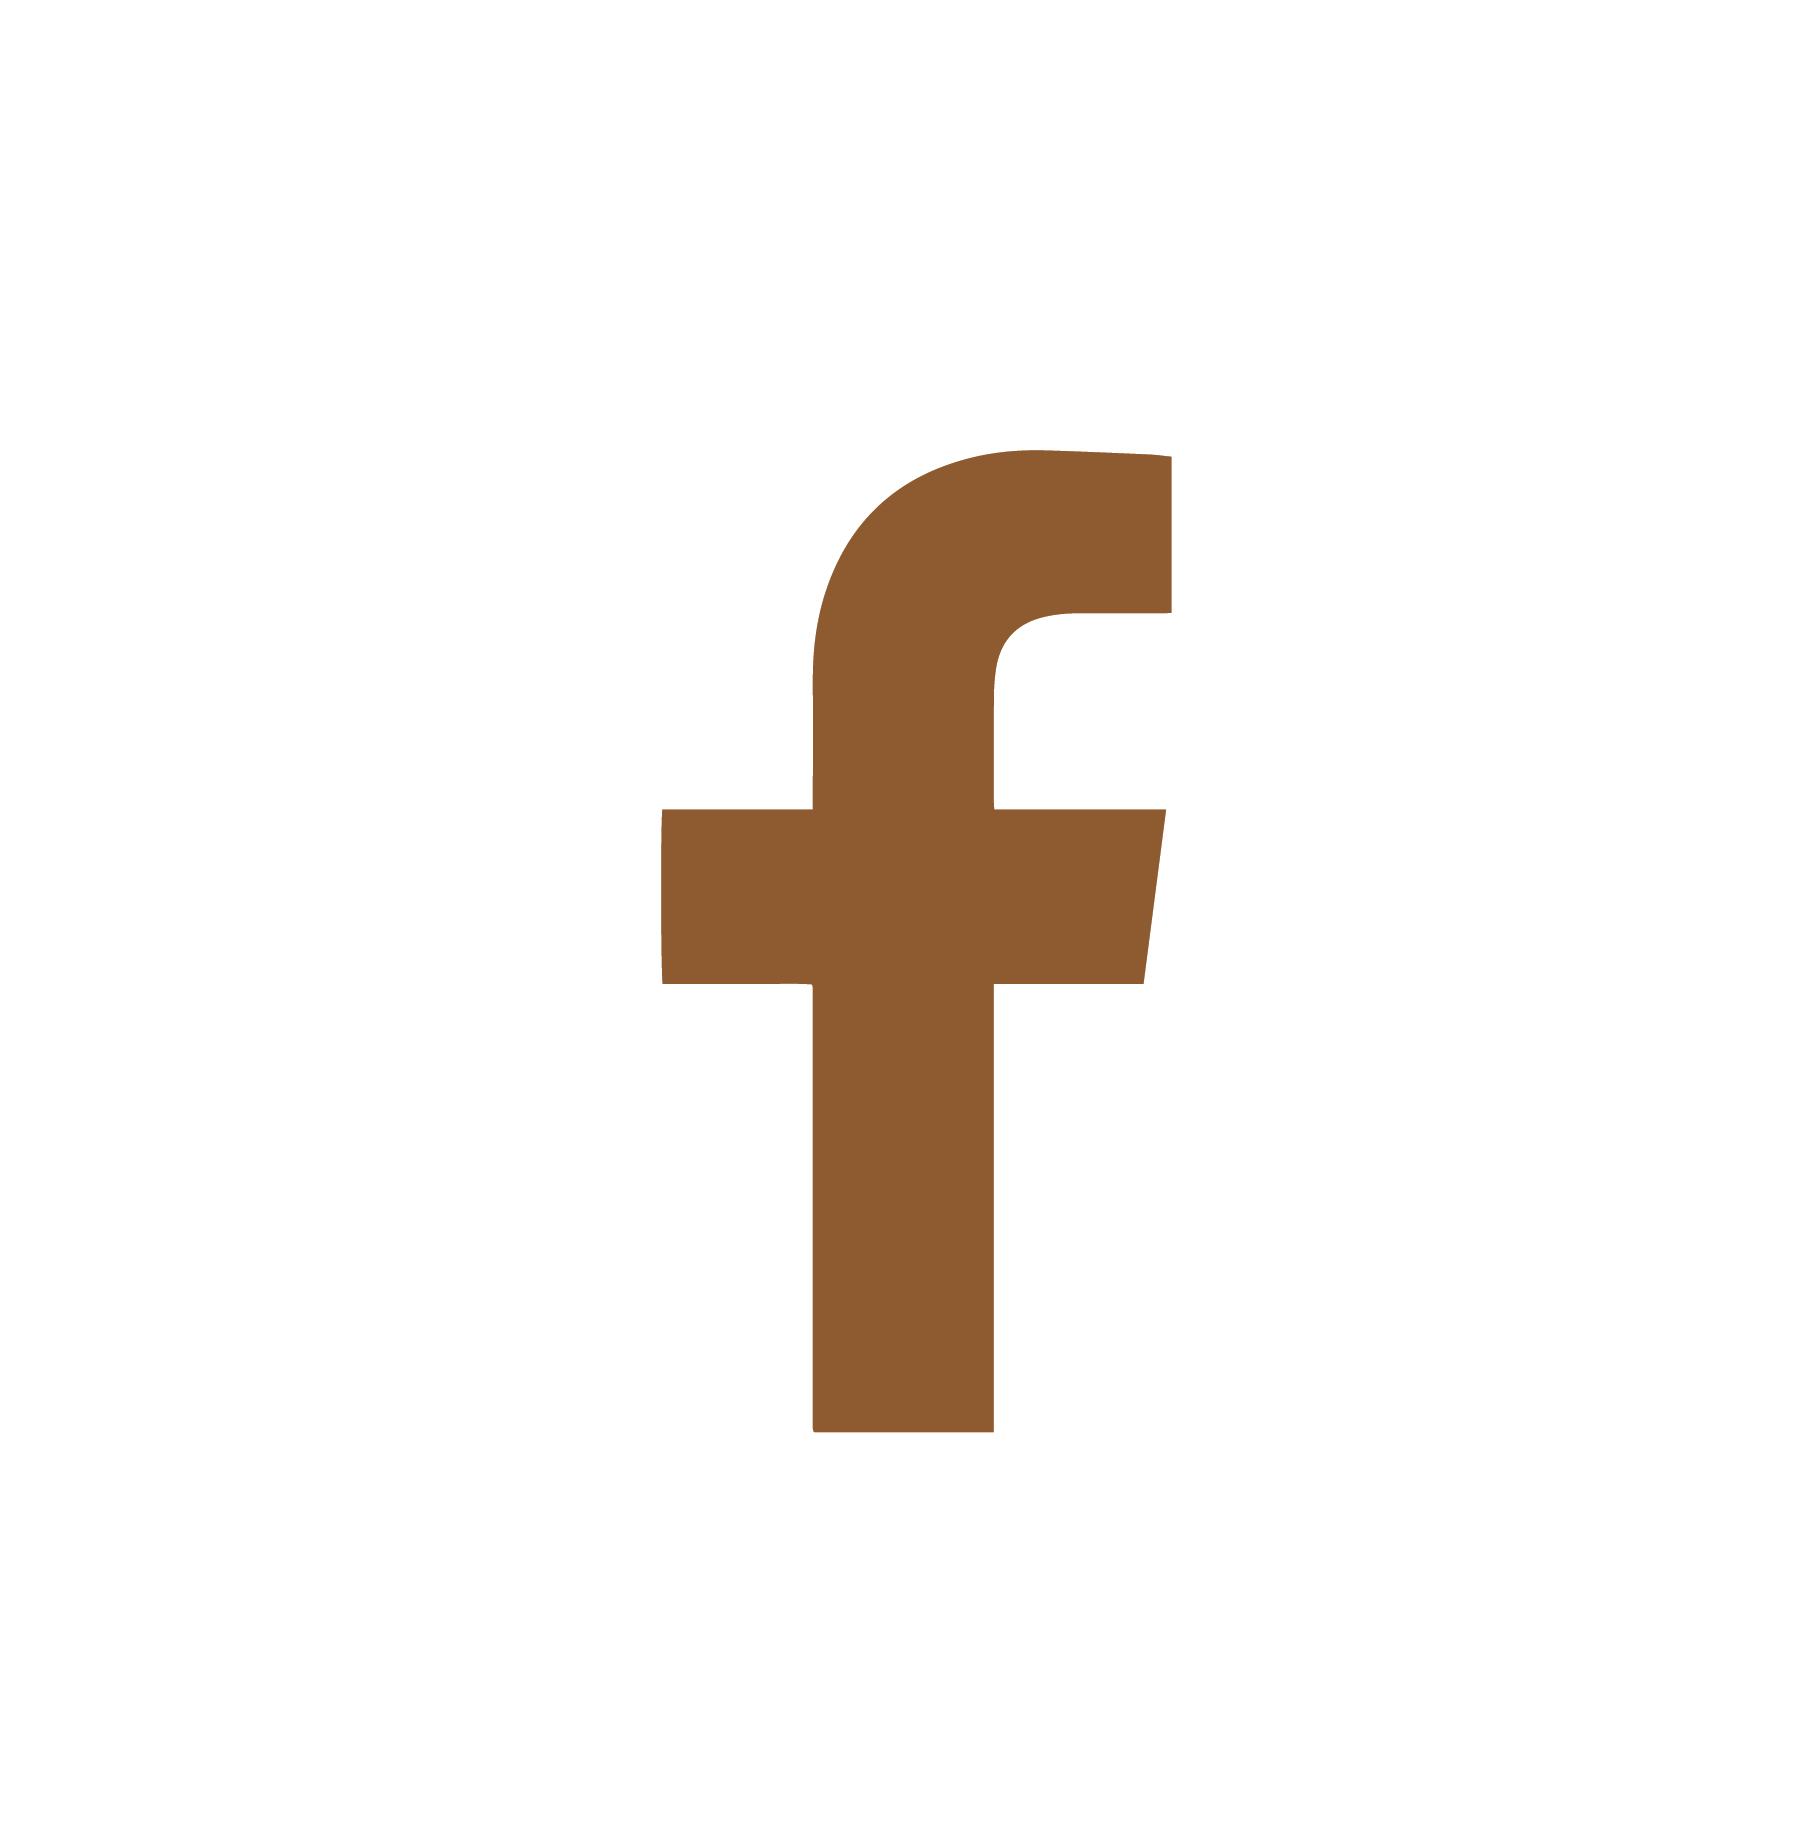 facbeook-01.png